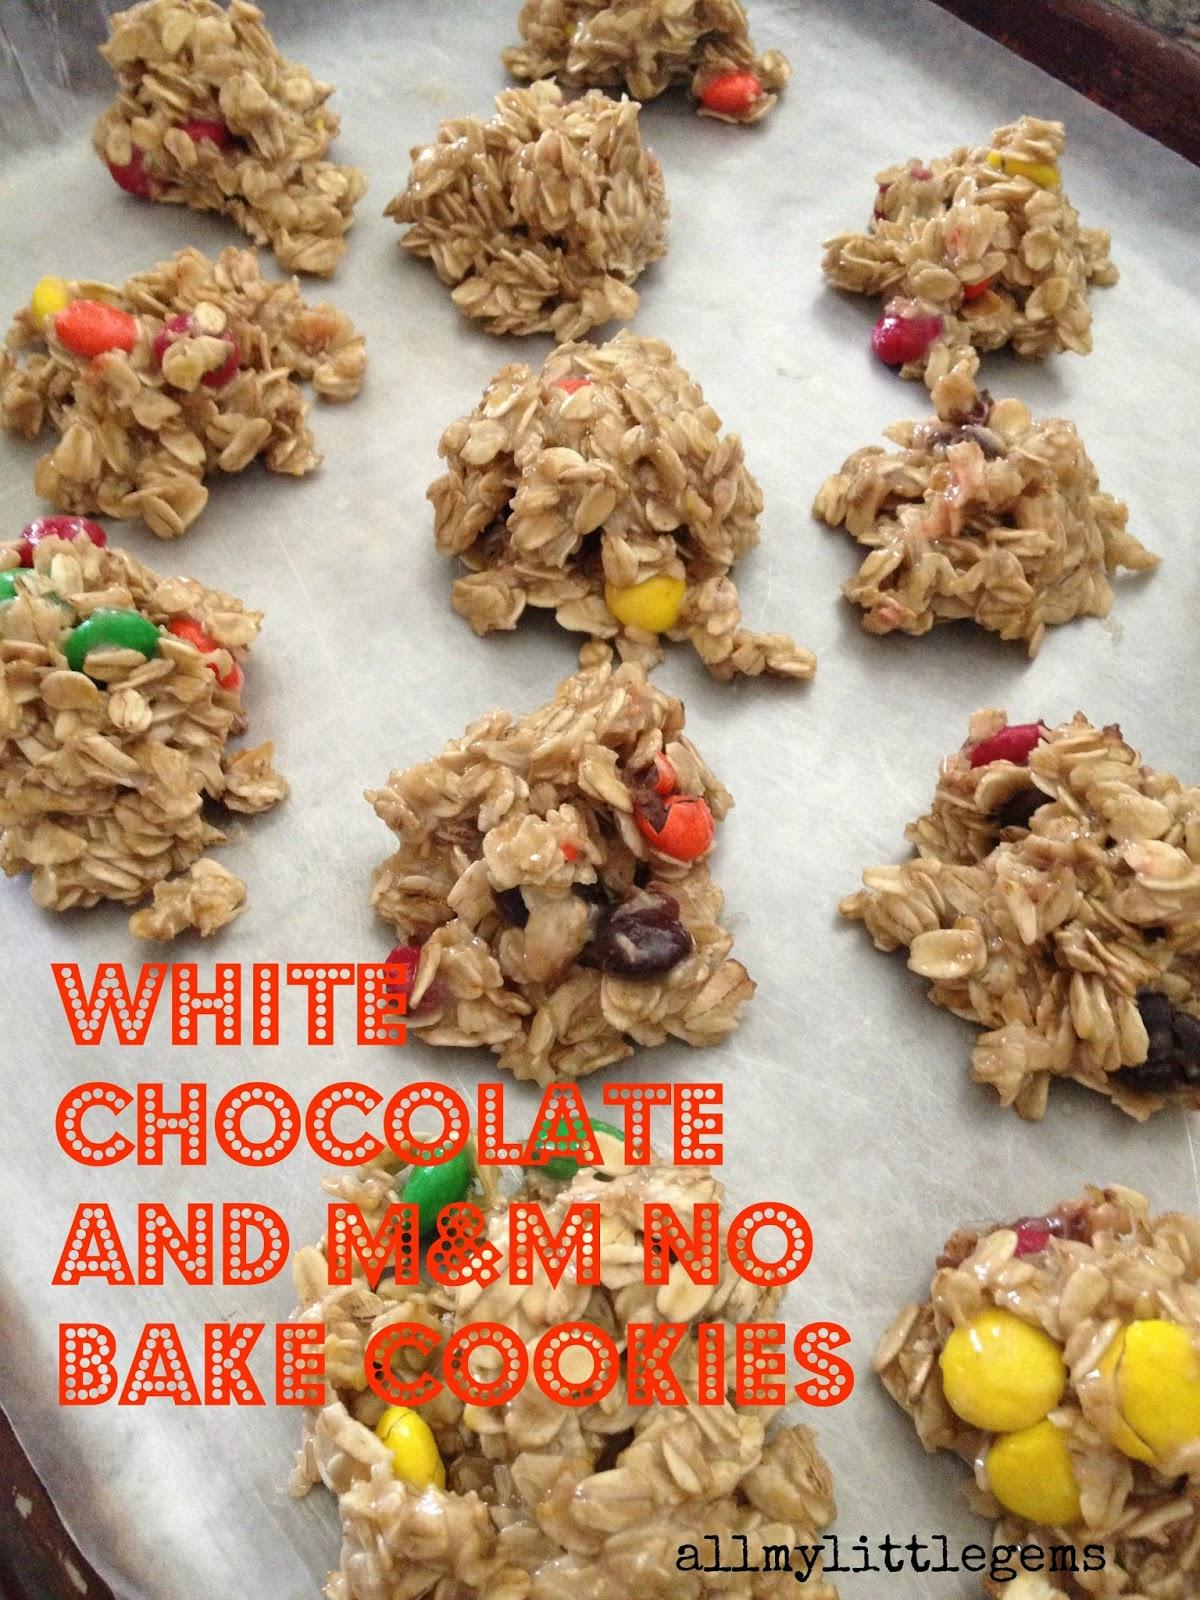 http://4.bp.blogspot.com/-2NqUDqv6we4/UiPUjuWgsiI/AAAAAAAAK3k/V1Lu5PQffpo/s1600/whitechocolatem&mcookies.jpg